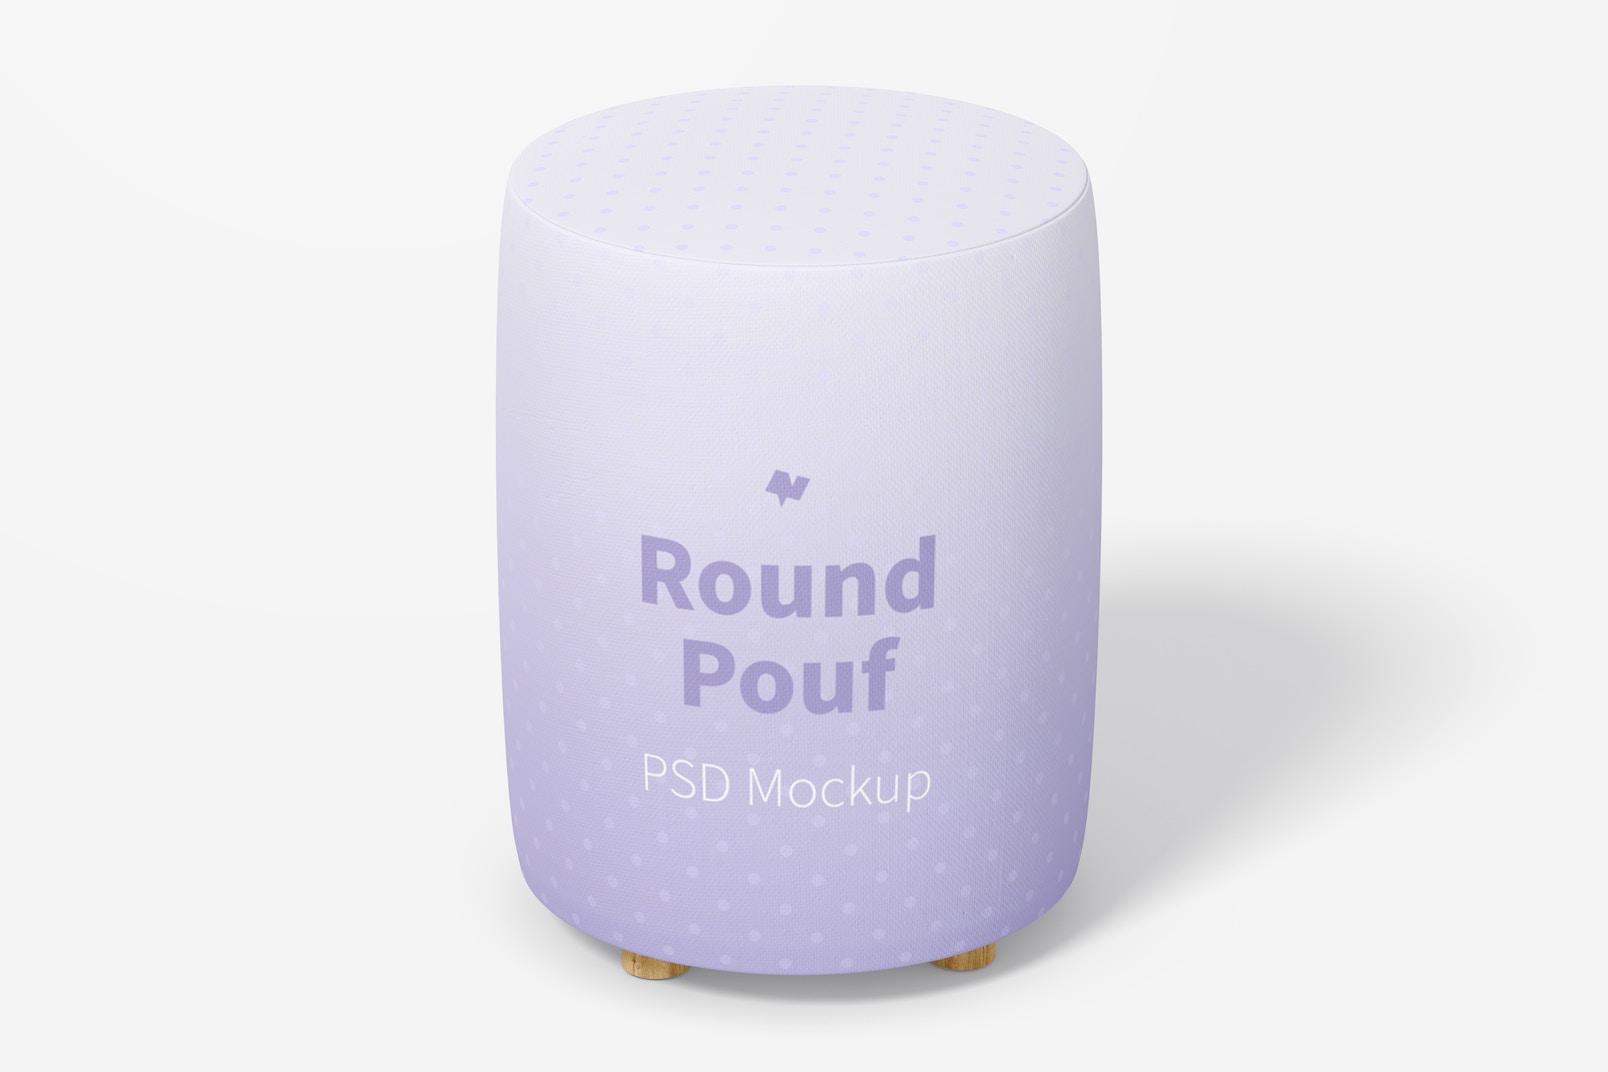 Round Pouf Mockup